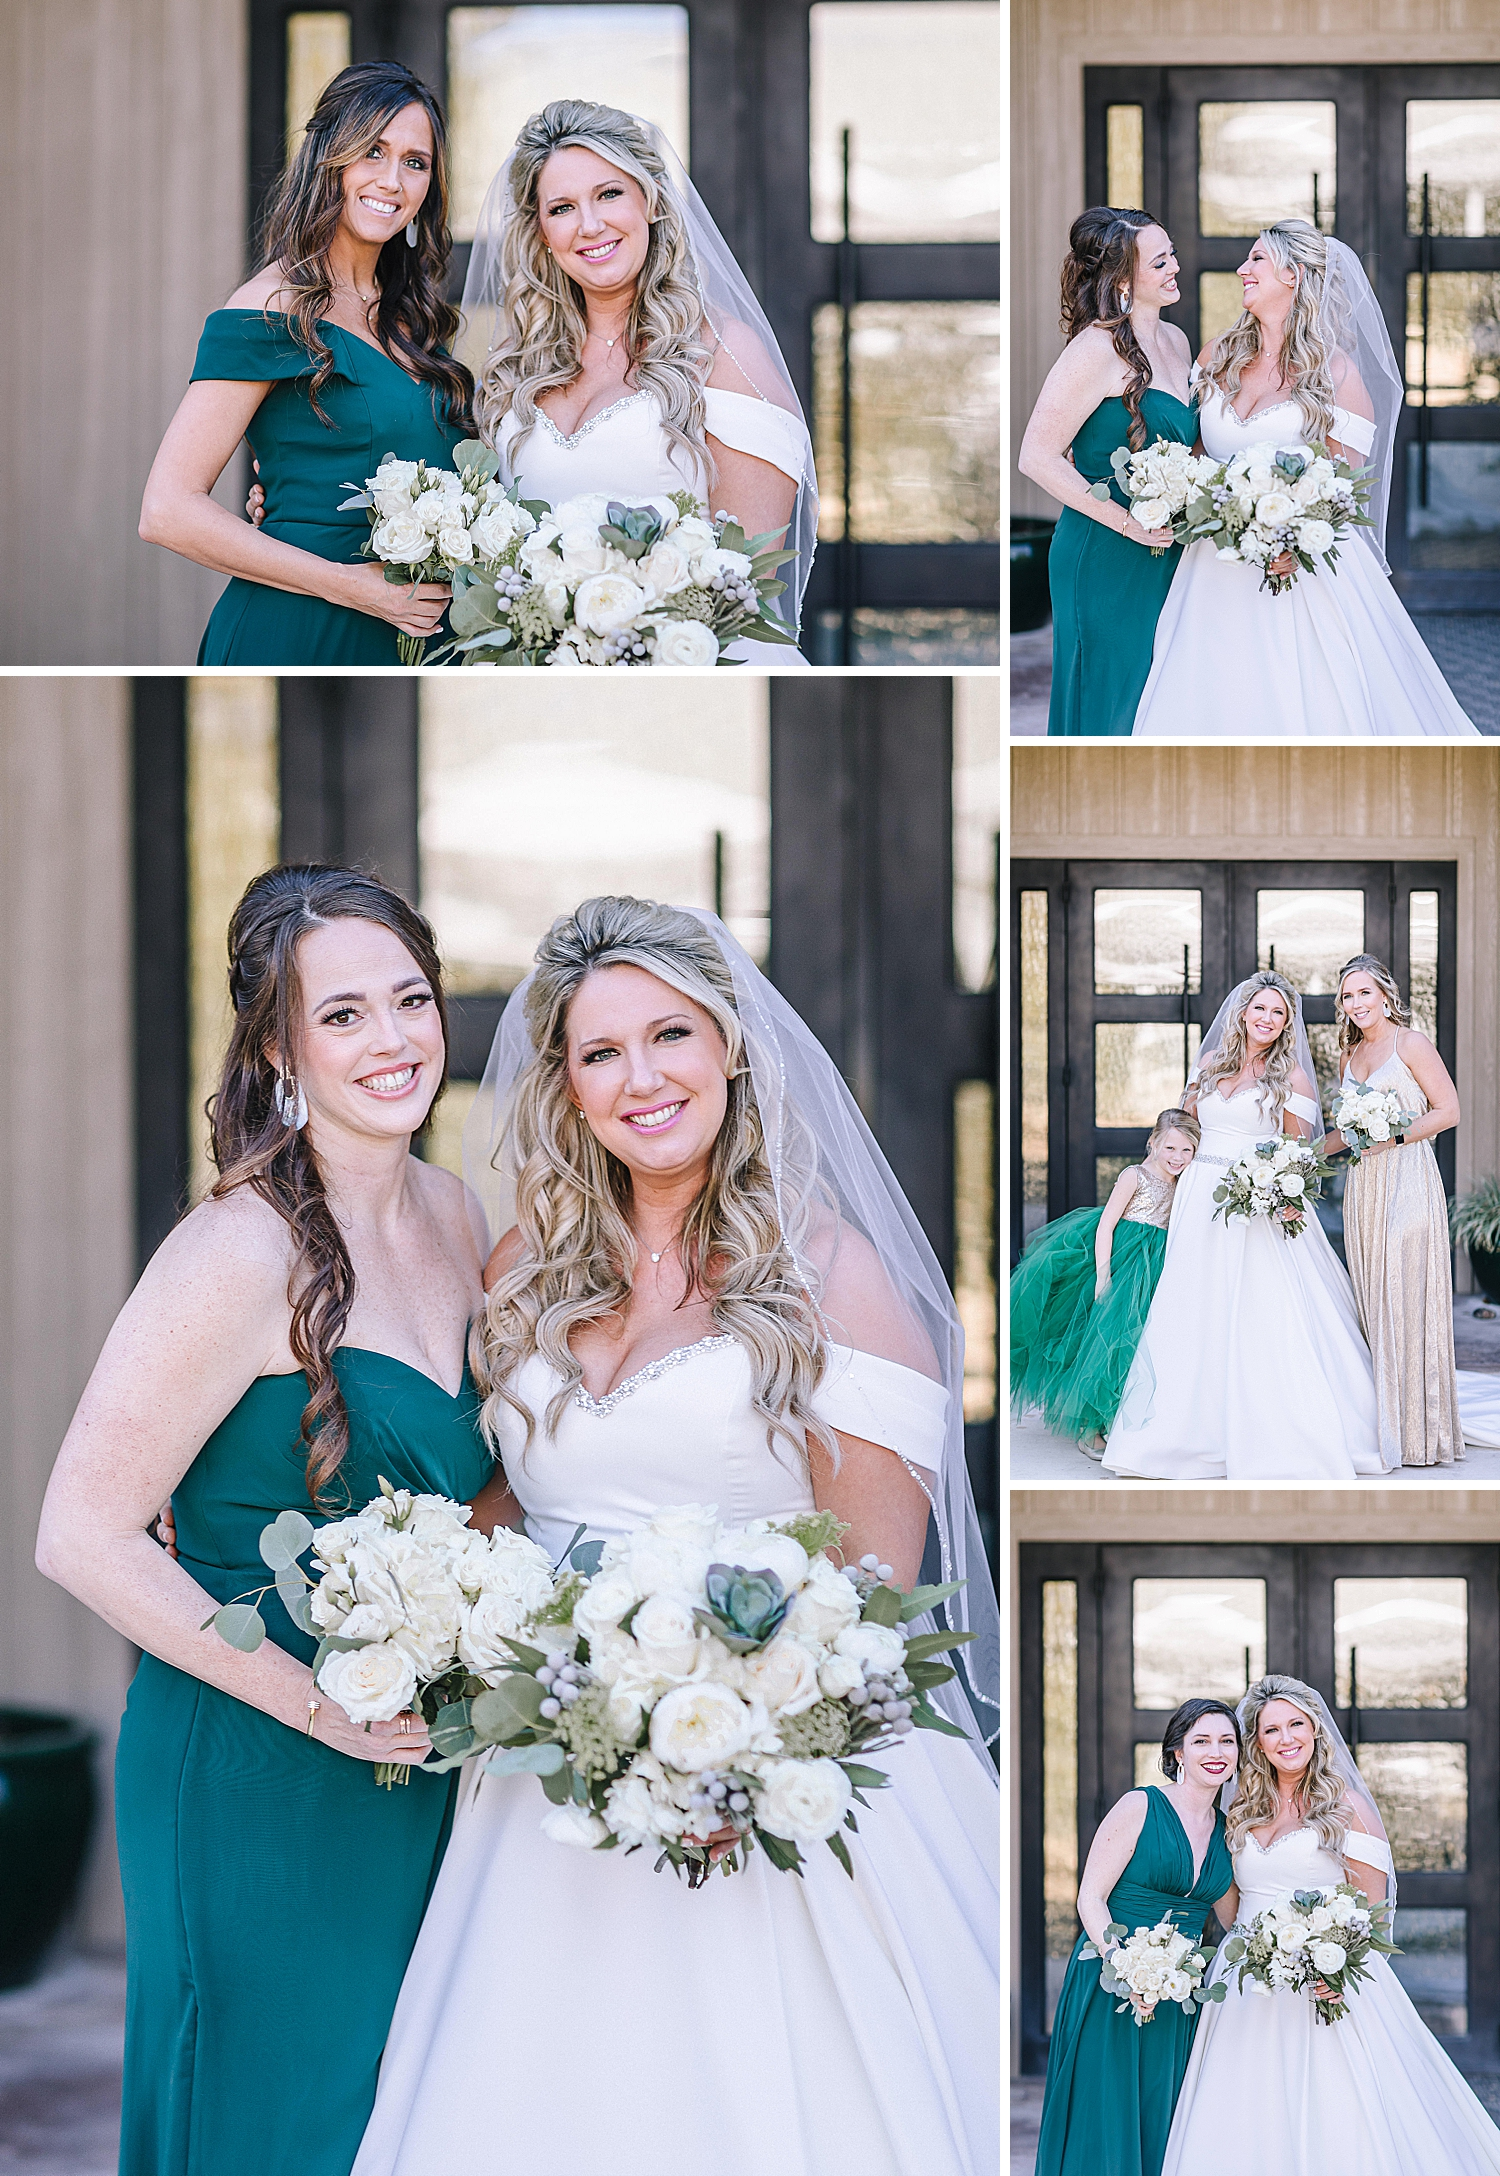 Magnolia-Halle-Wedding-San-Antonio-Texas-Bride-Grom_0046.jpg